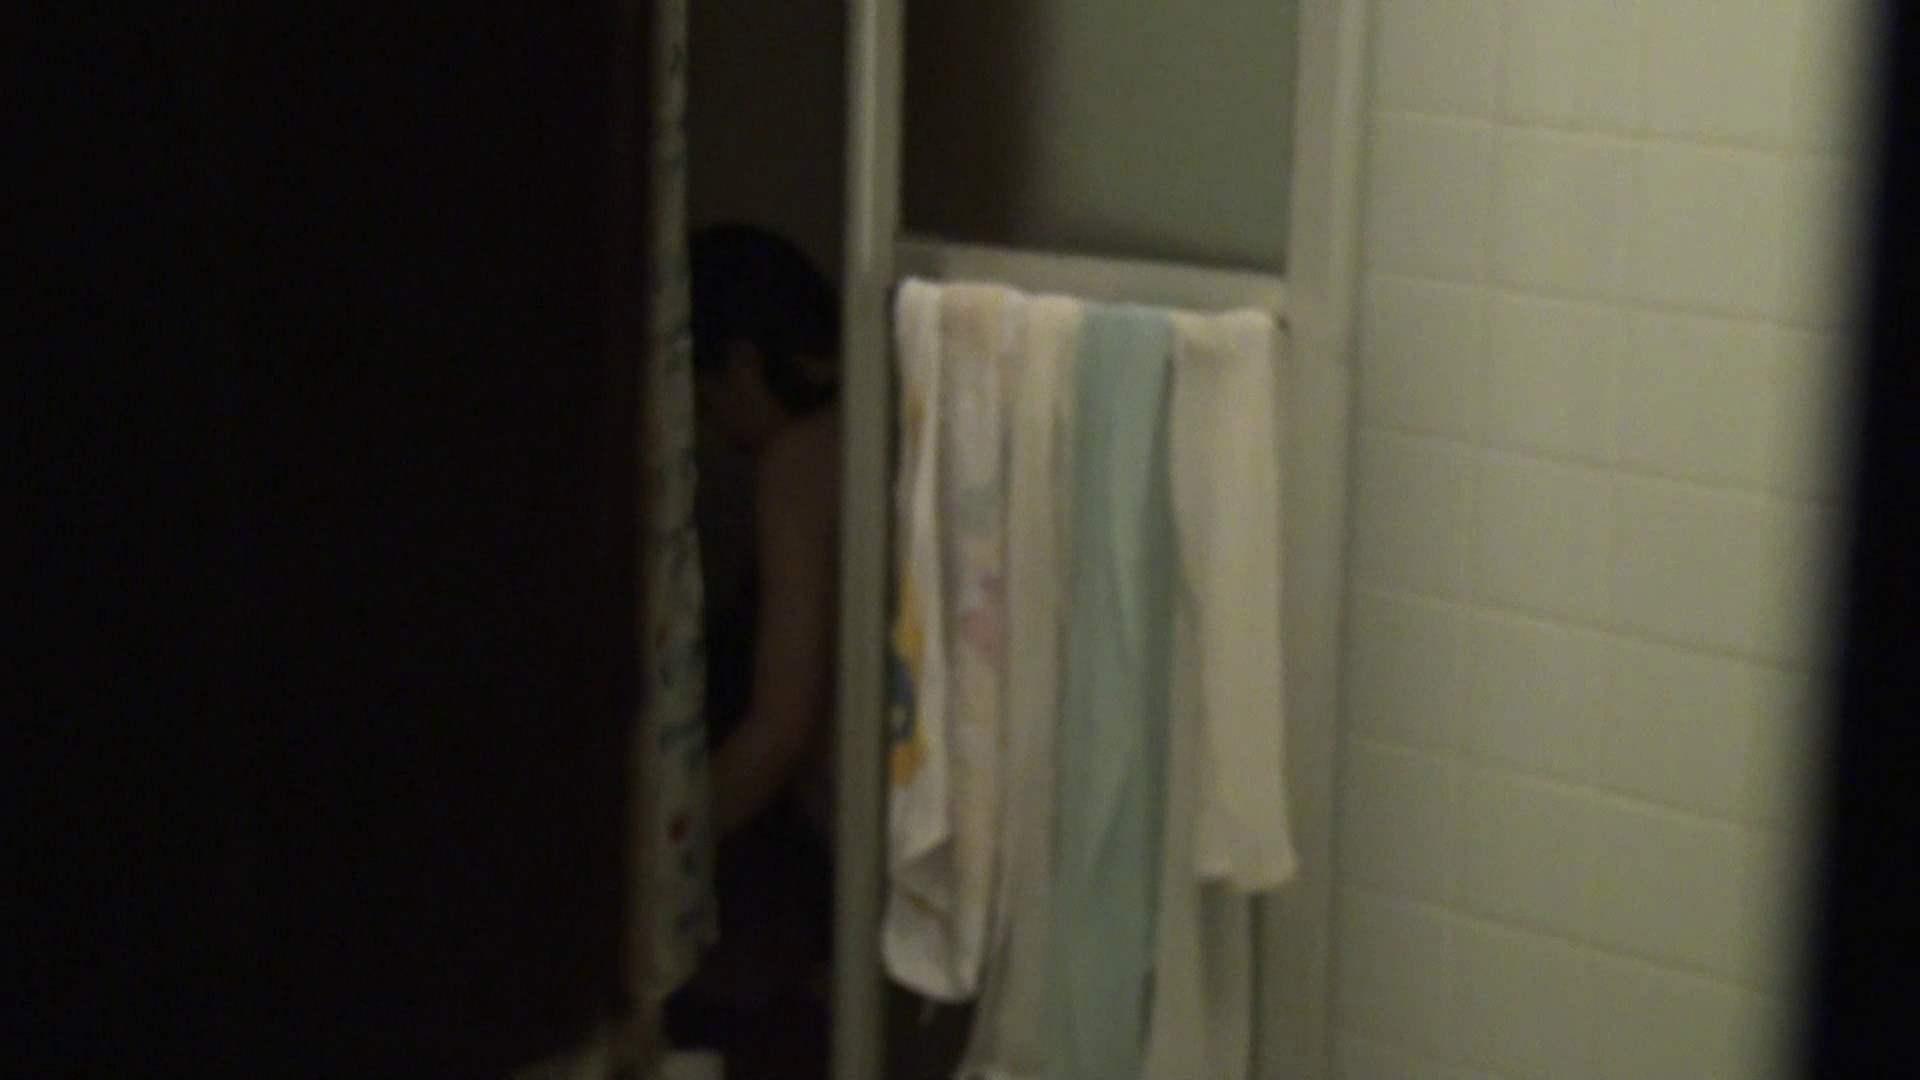 vol.06顔を洗い流す極上お女市さんの裸体をハイビジョンで!風呂上り着替え必見! 民家 スケベ動画紹介 68画像 61